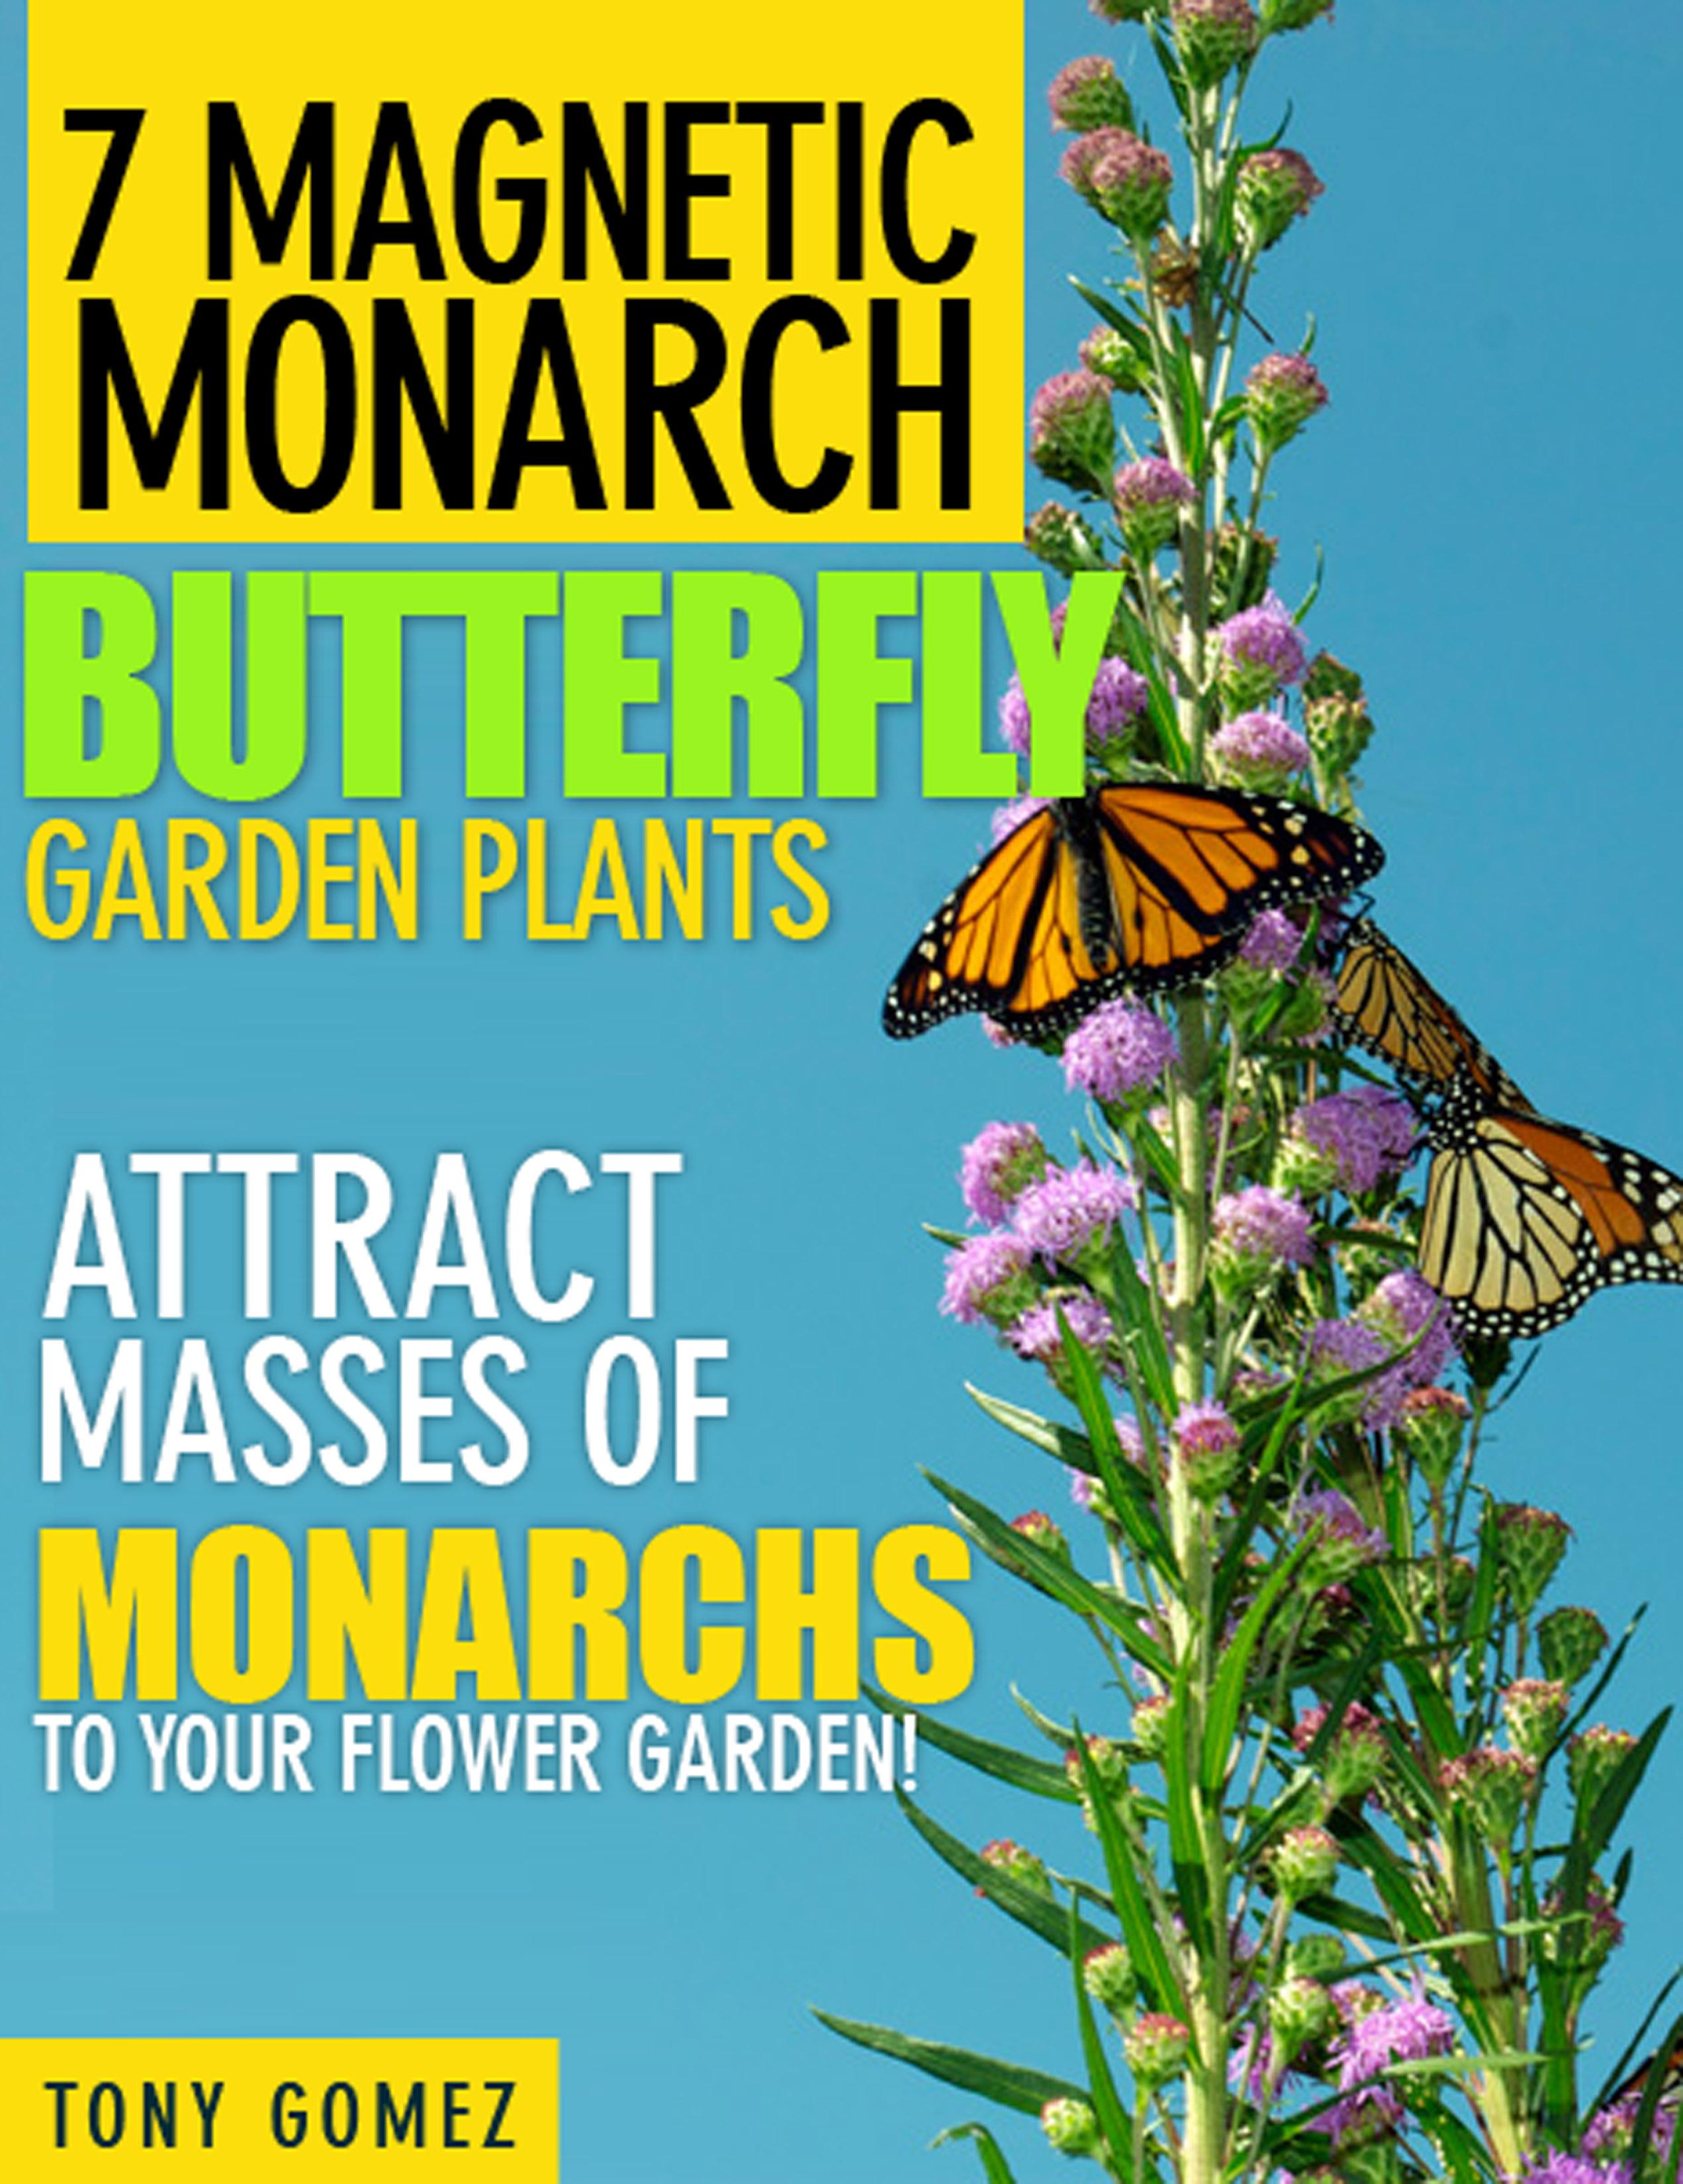 A Dangerous Decline In Butterflies Start Your Monarch